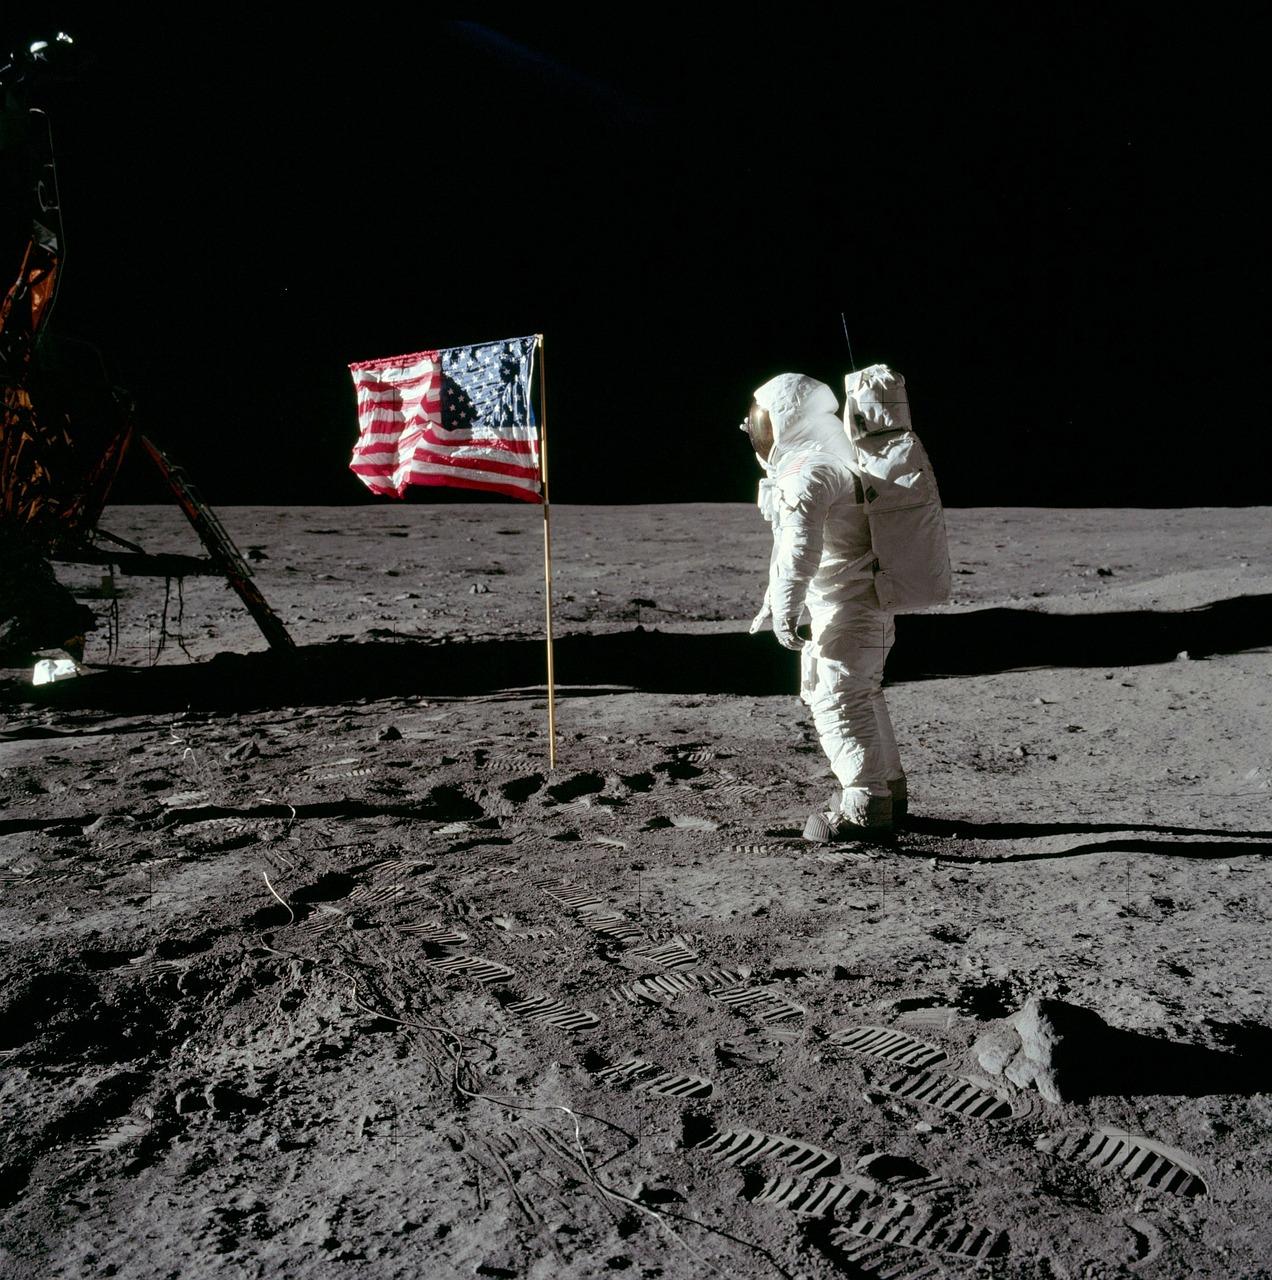 moon-landing-62879_1280.jpg